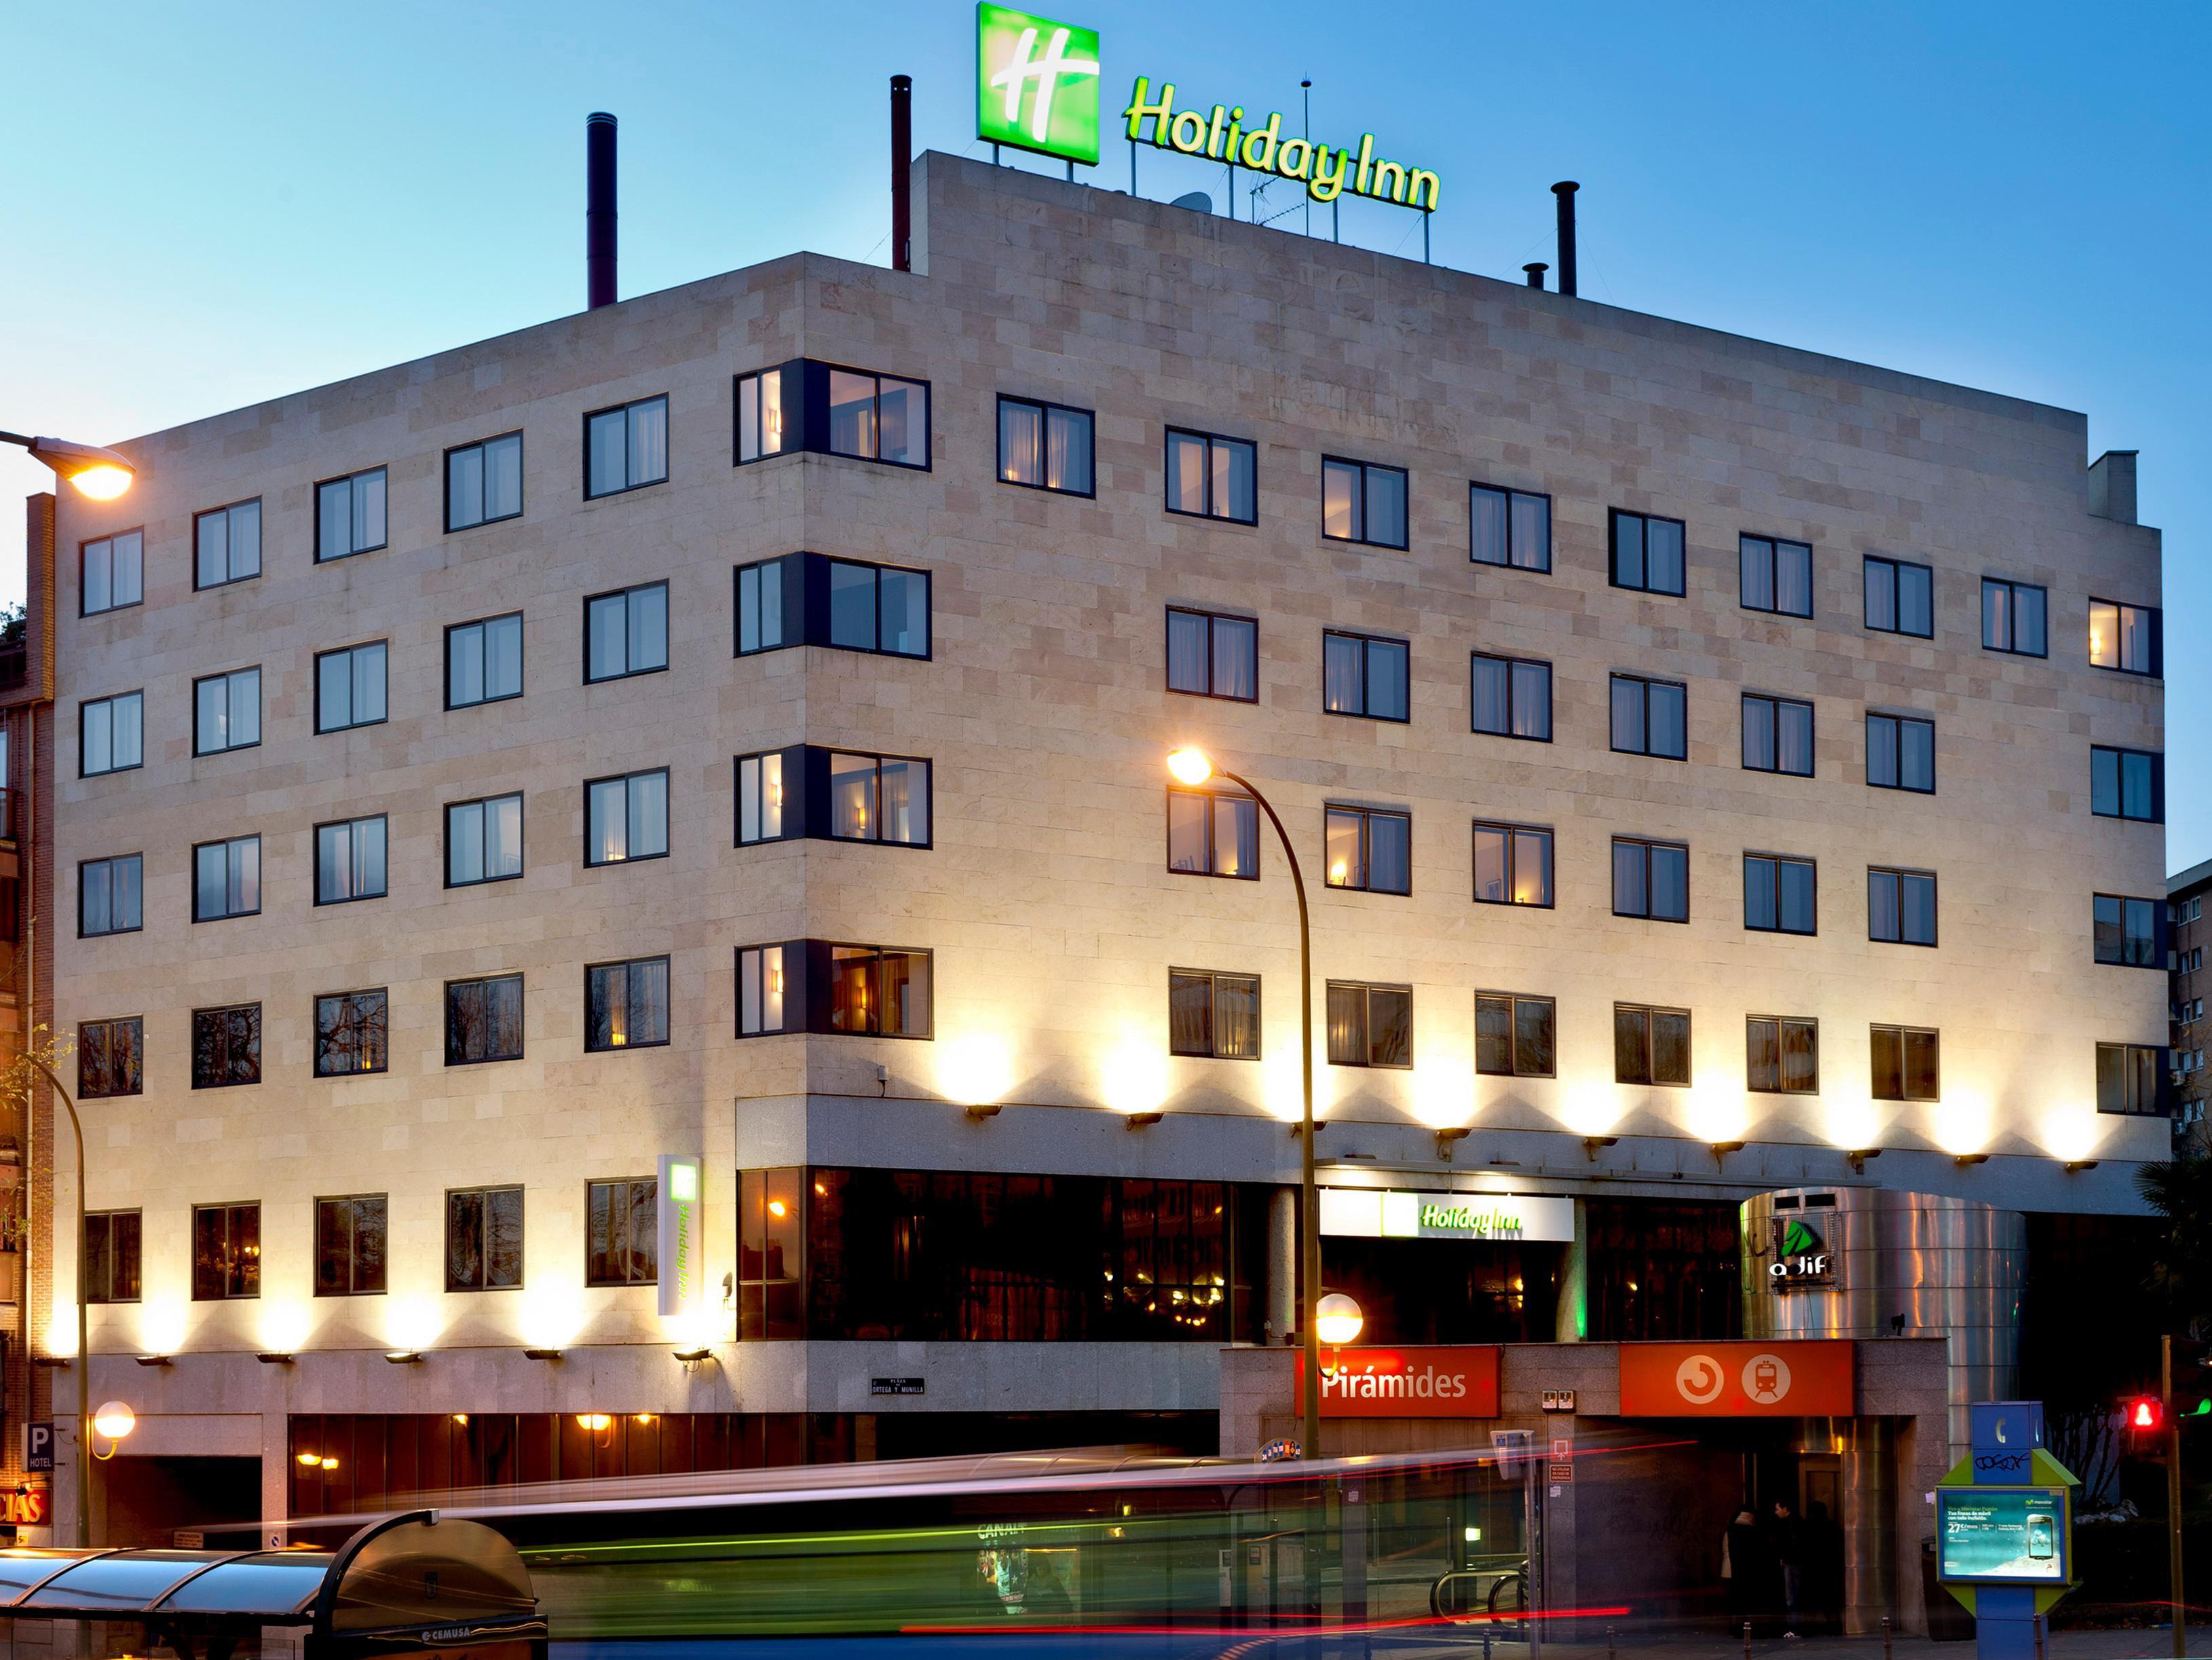 Holiday Inn Madrid - Piramides Hotel by IHG